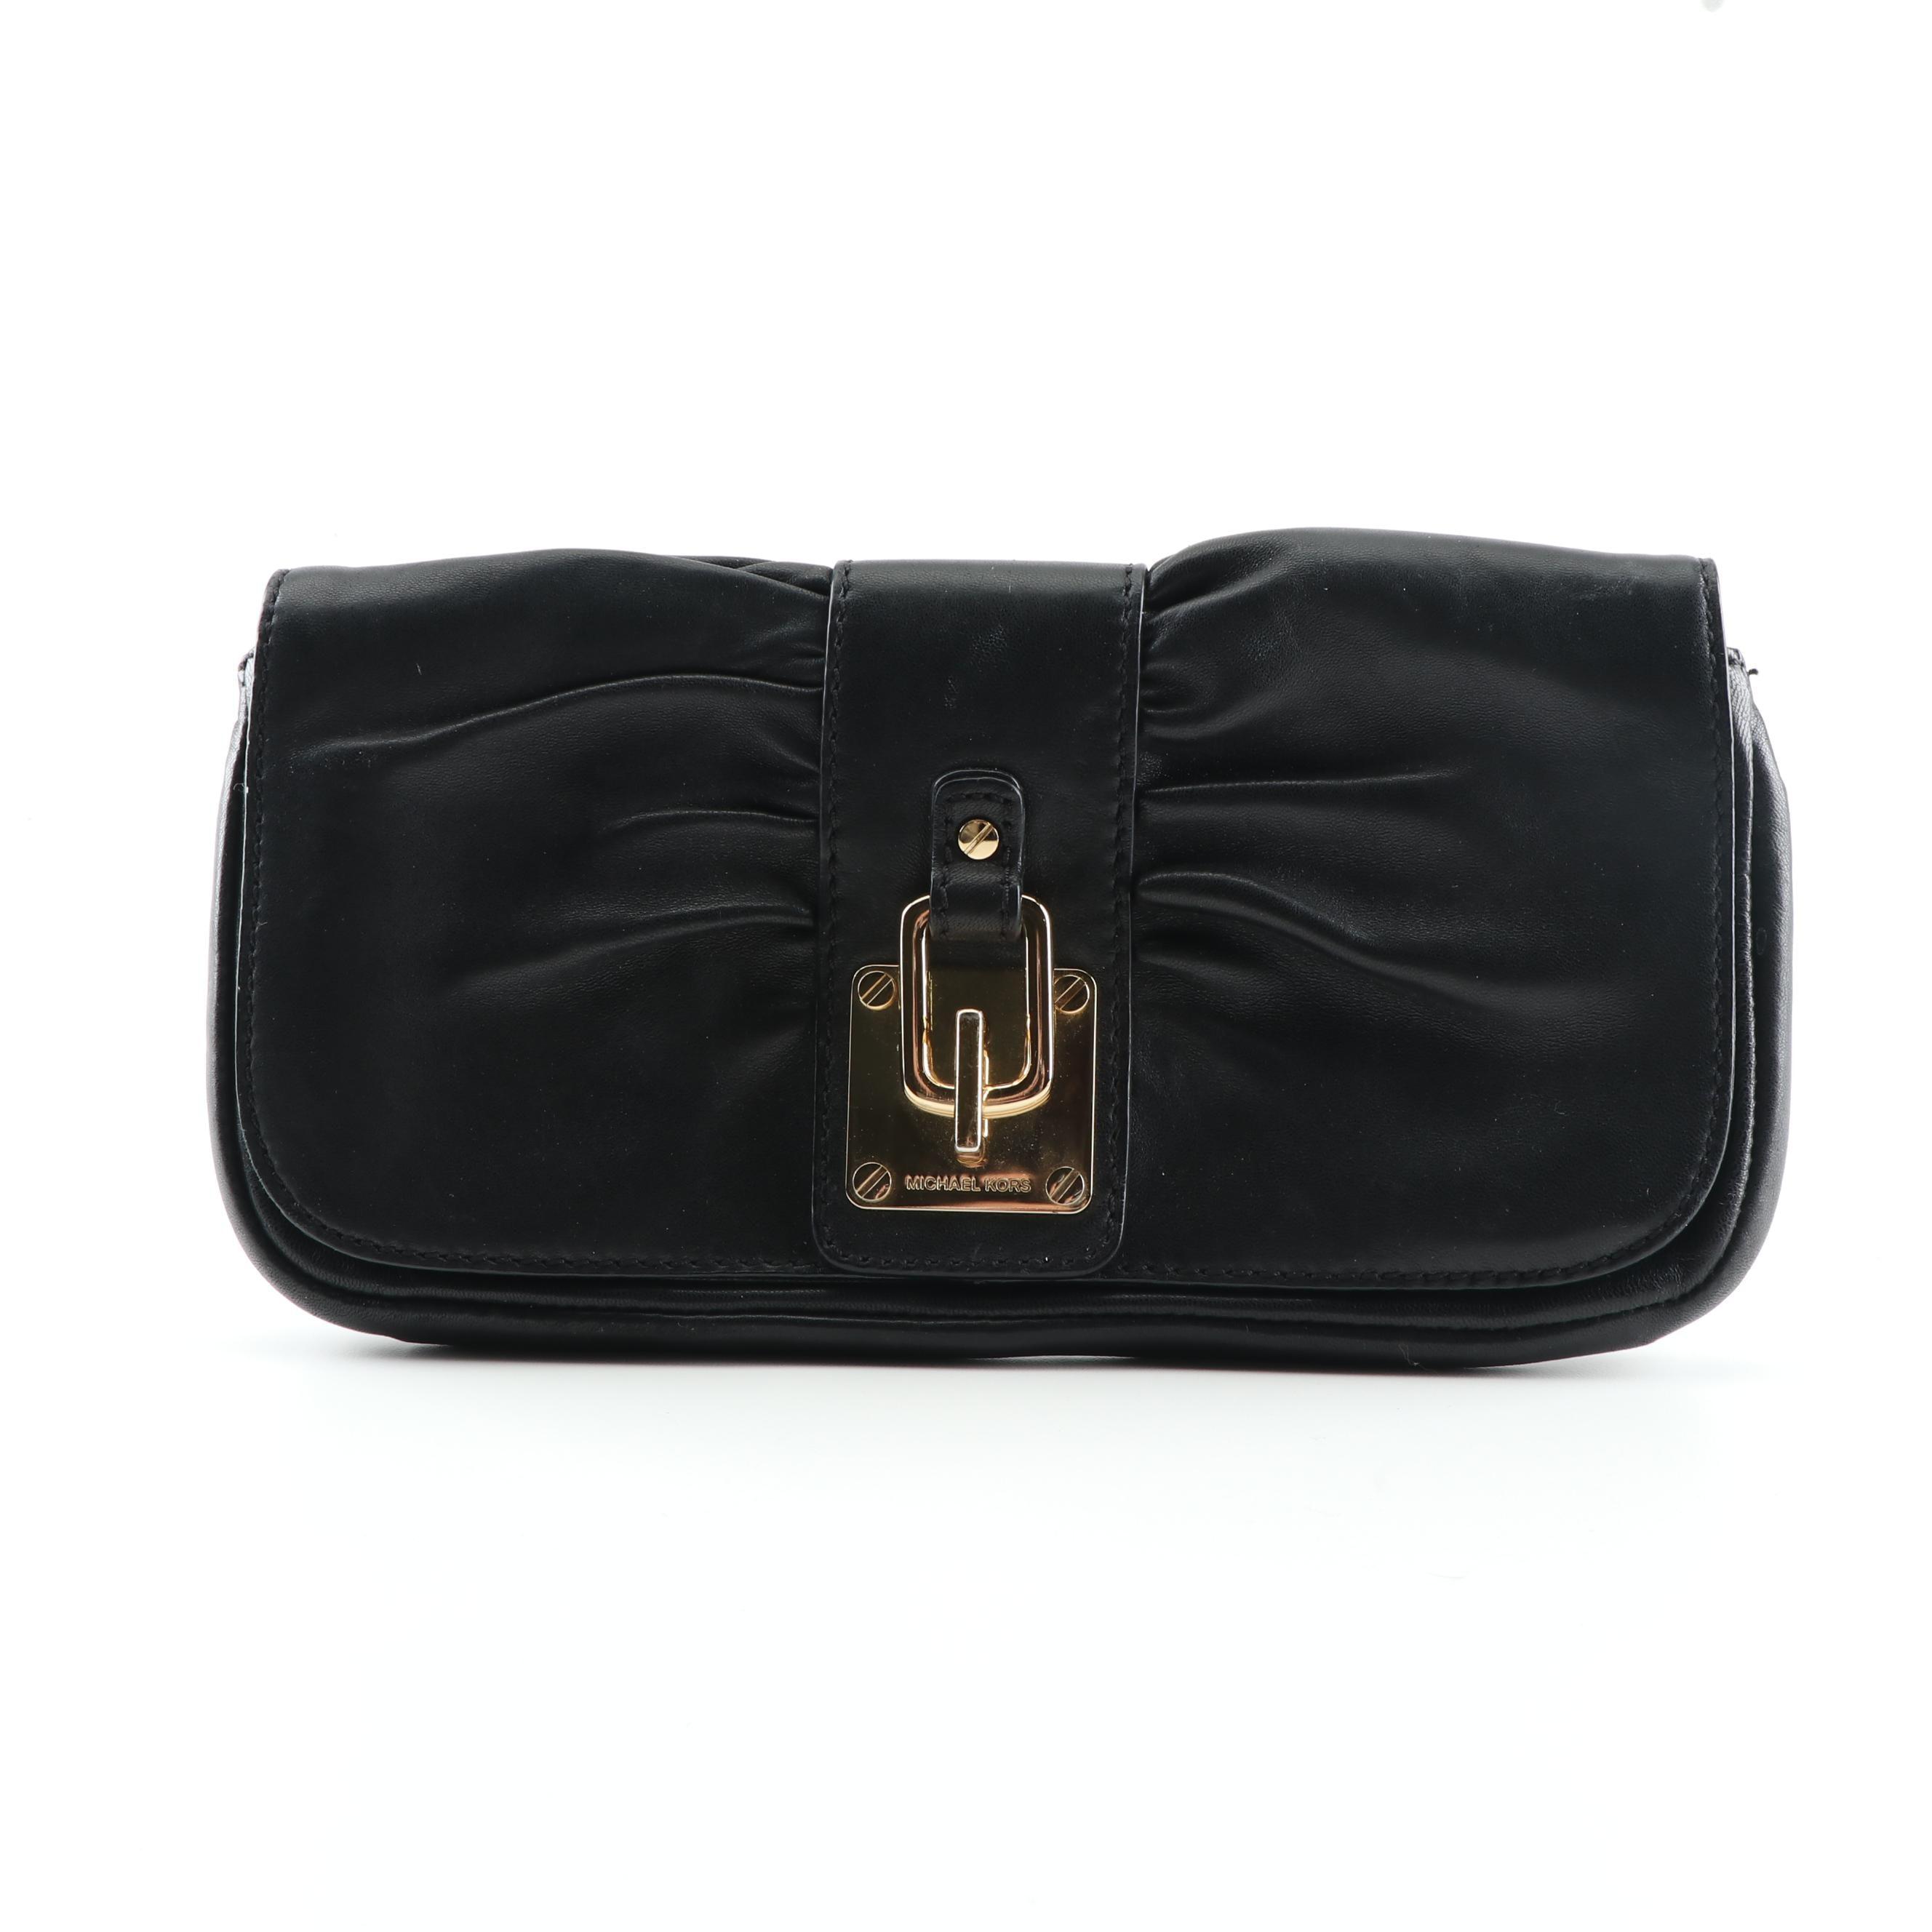 MICHAEL Michael Kors Black Leather Clutch